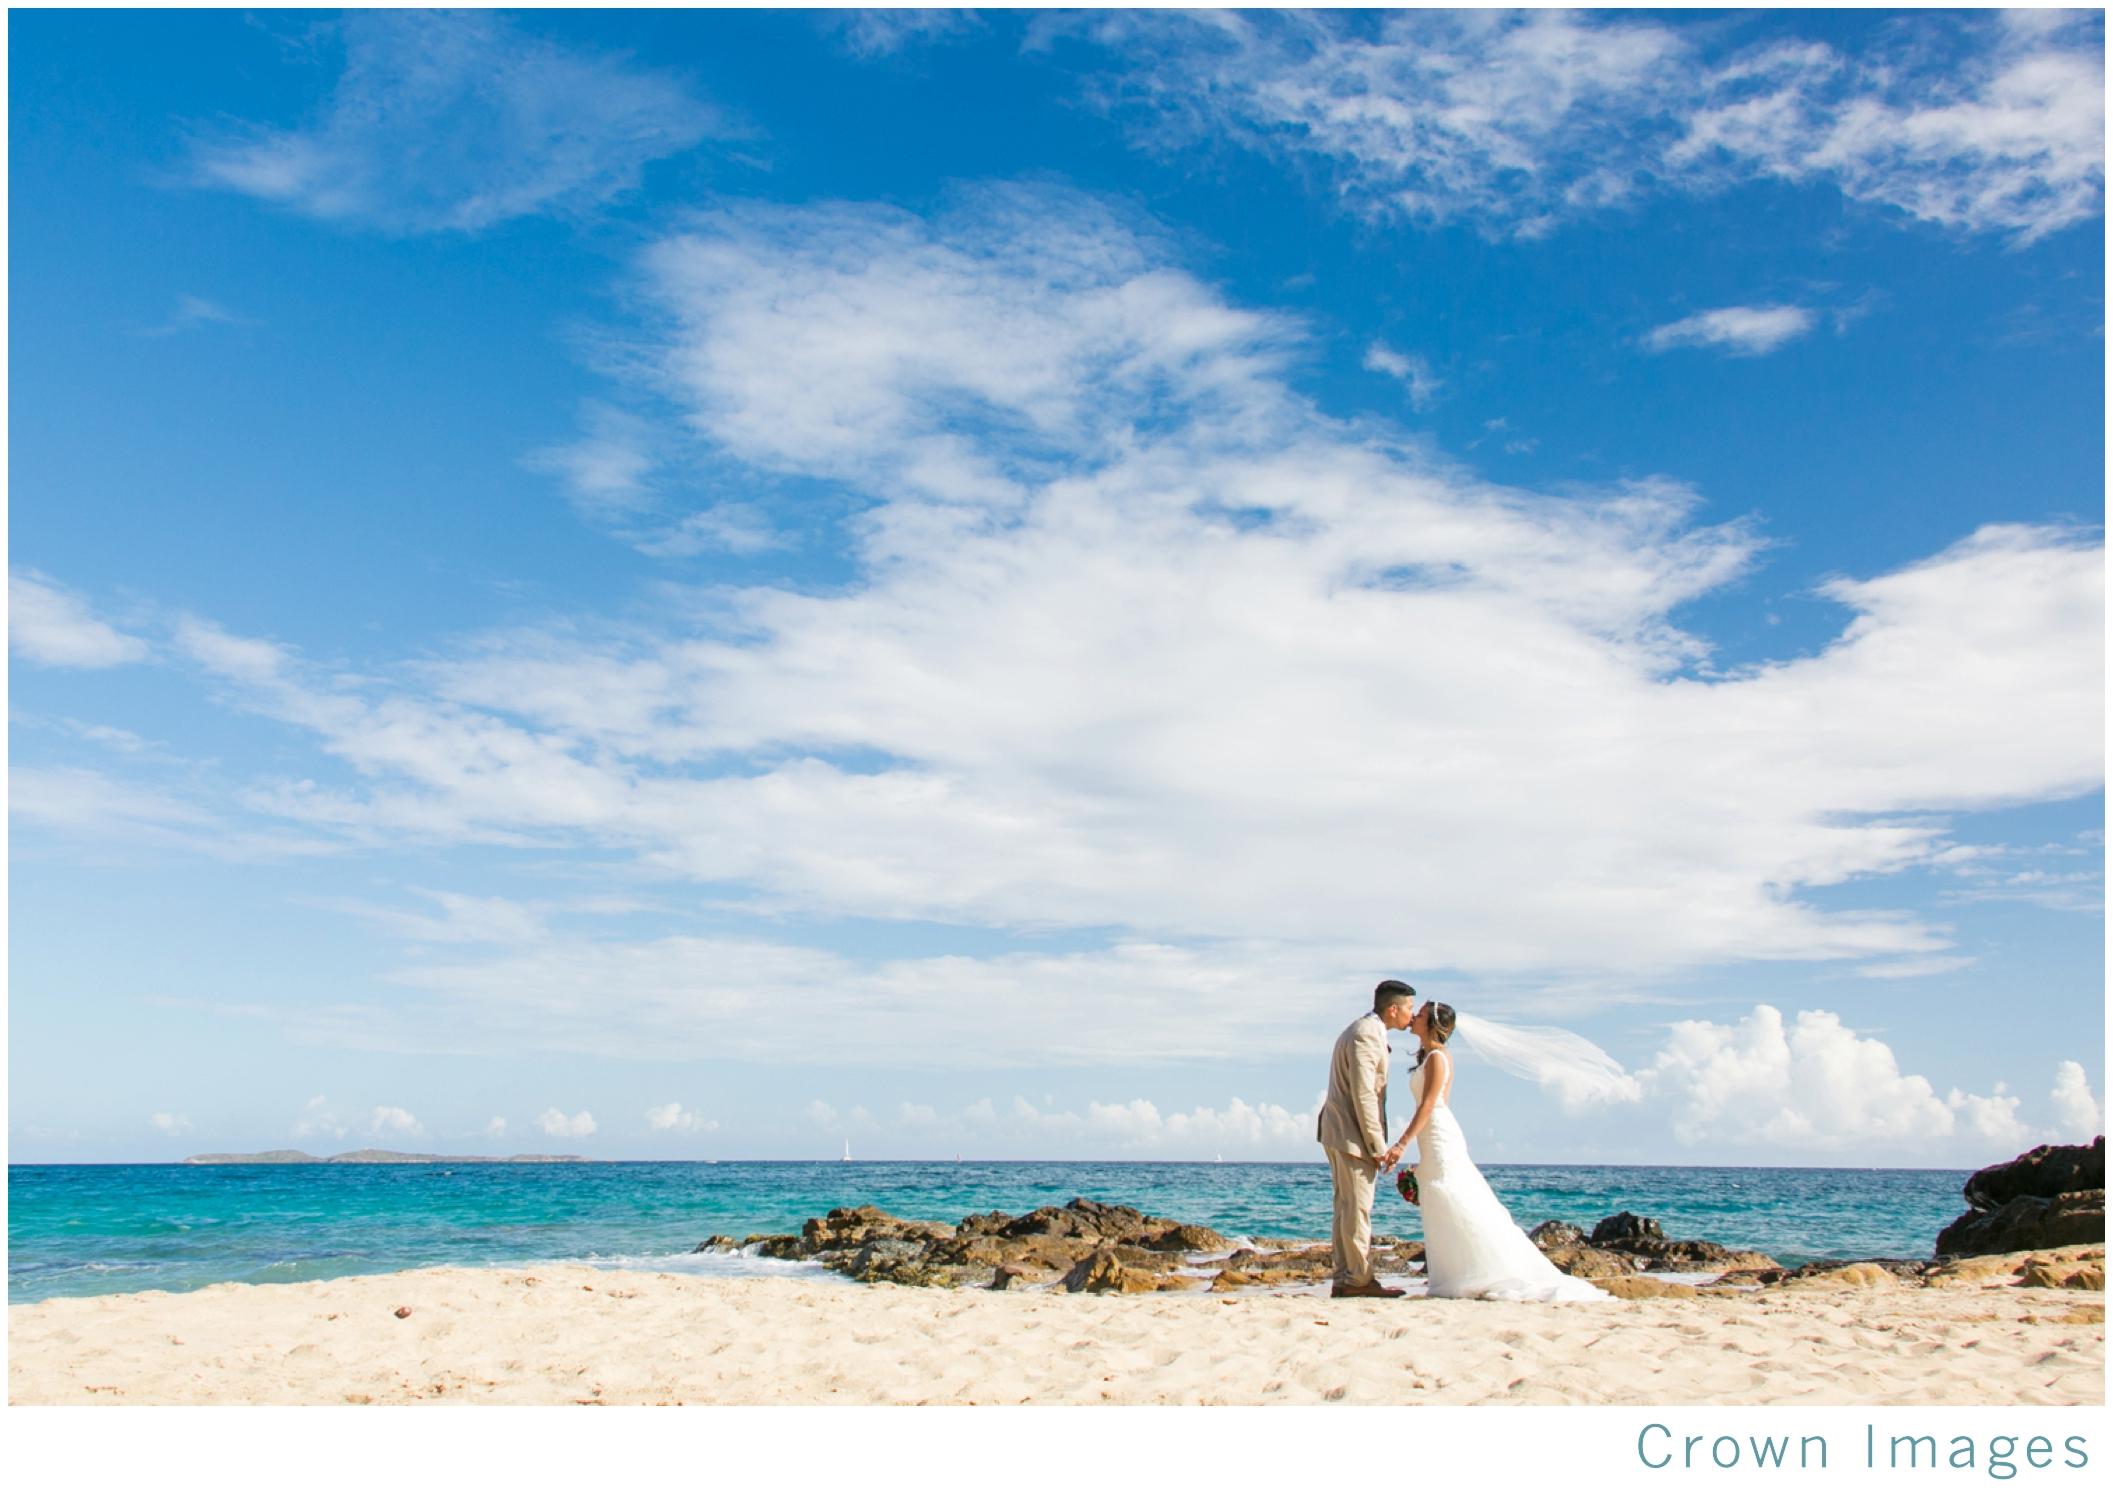 st-thomas-wedding-photography_1803.jpg